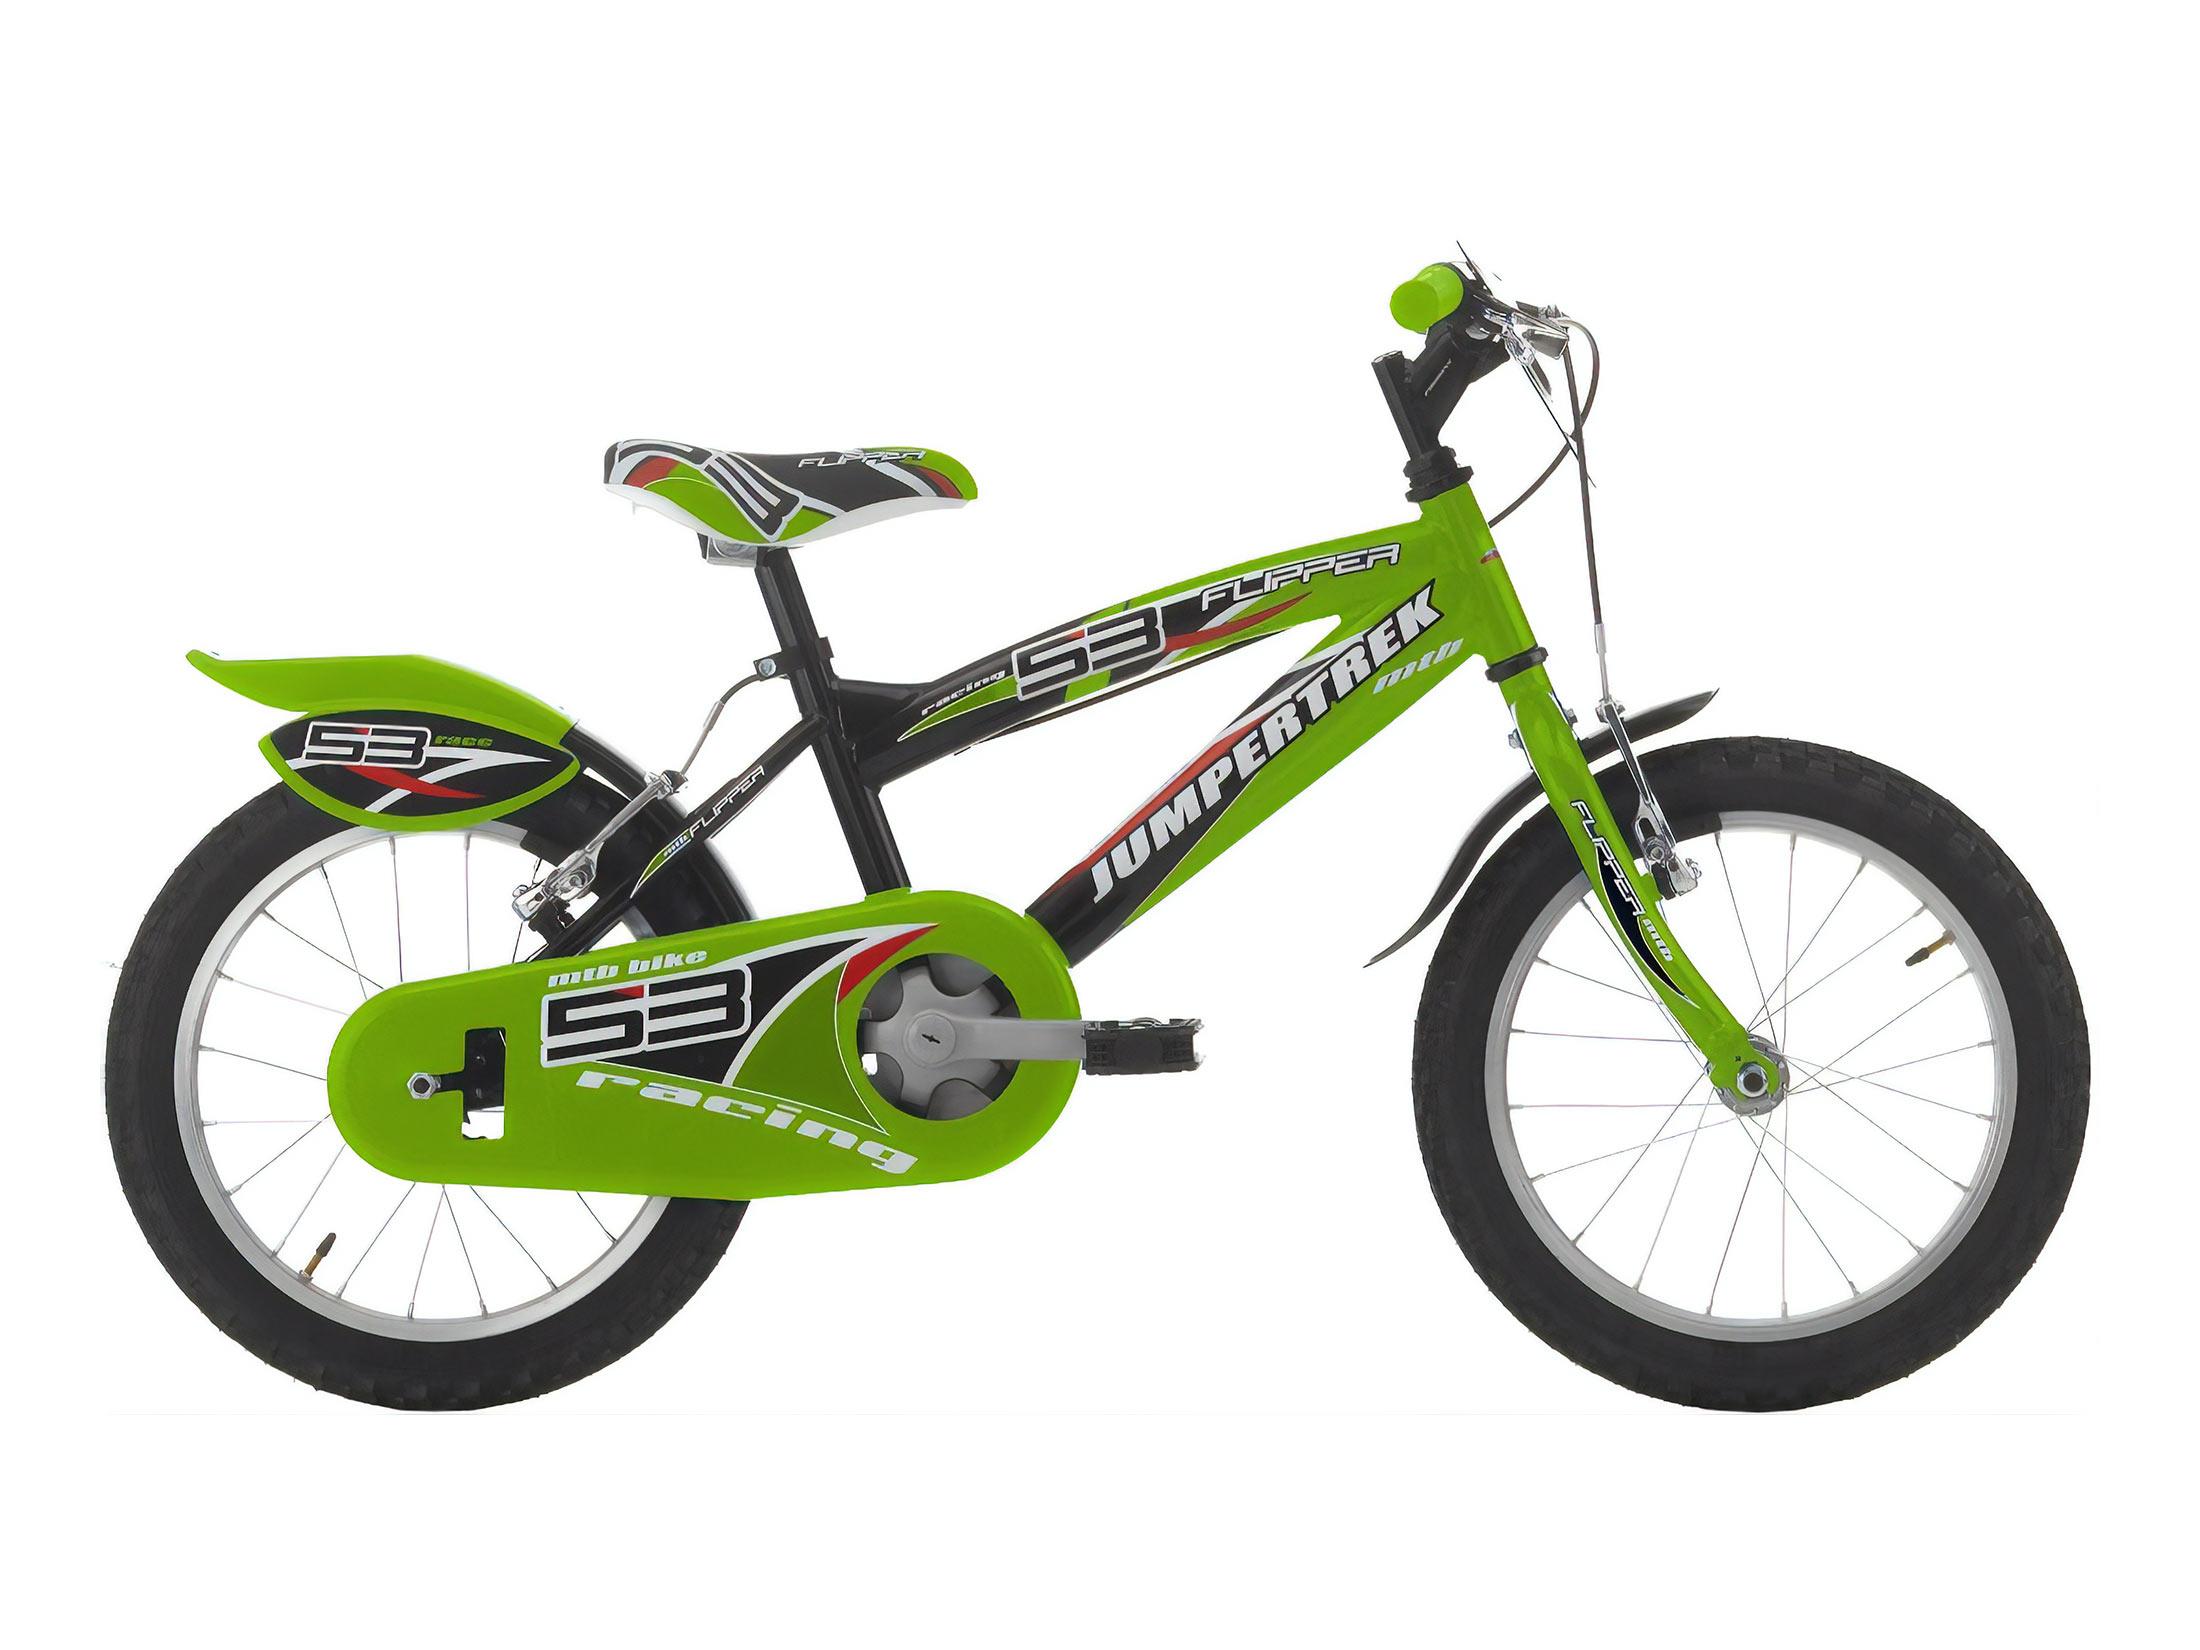 259a4cfb165a Ποδήλατα